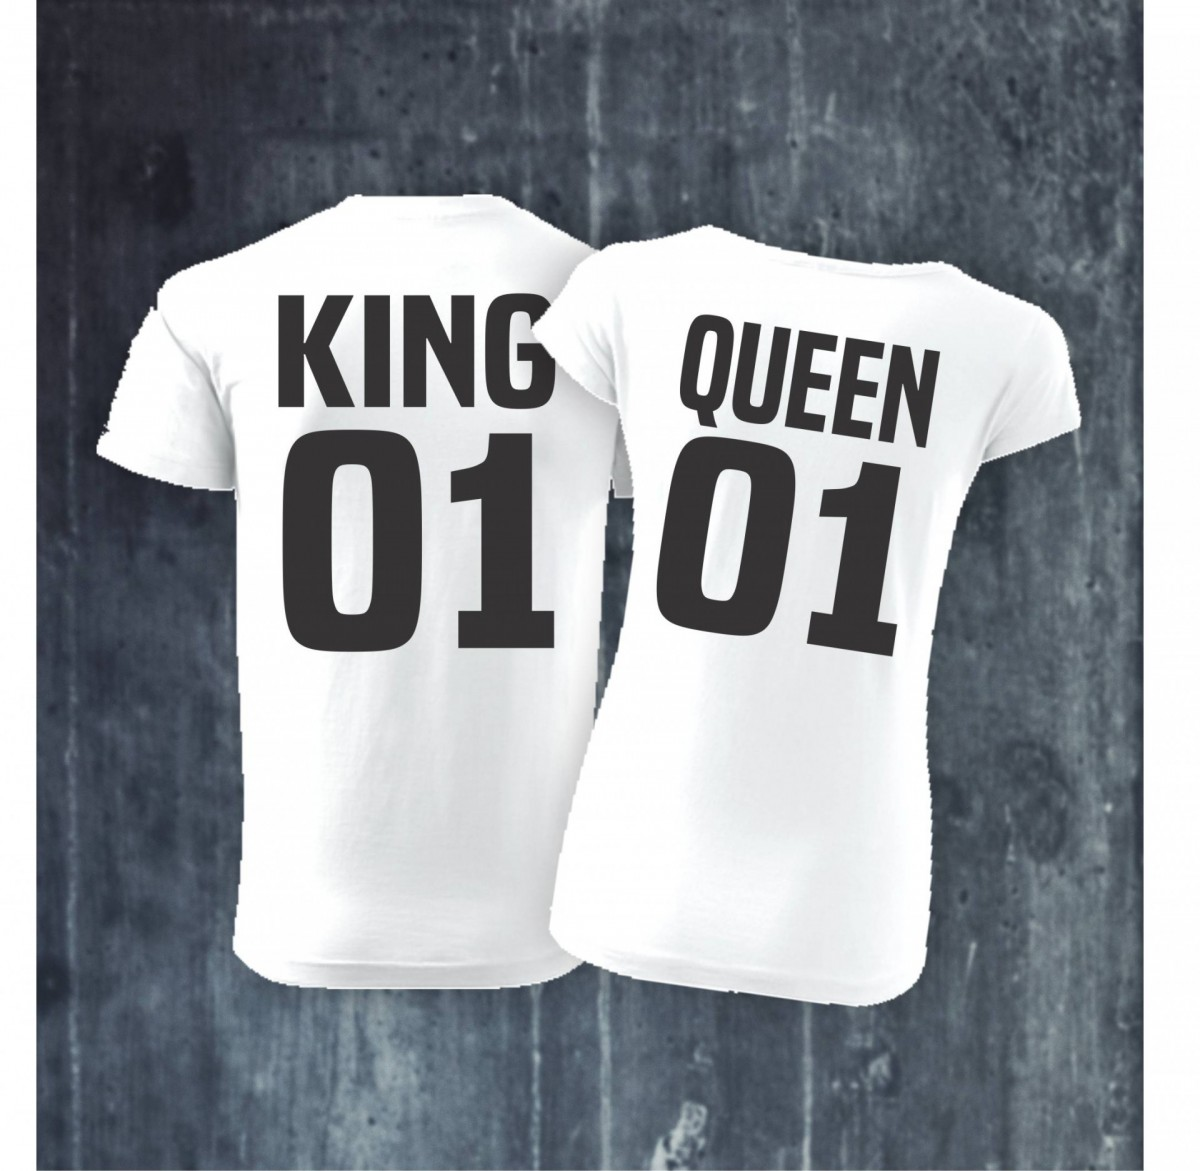 b0796a47e34d Pánske dámske tričko KING 01 - QUEEN 01 ǀ Fajntričko.sk